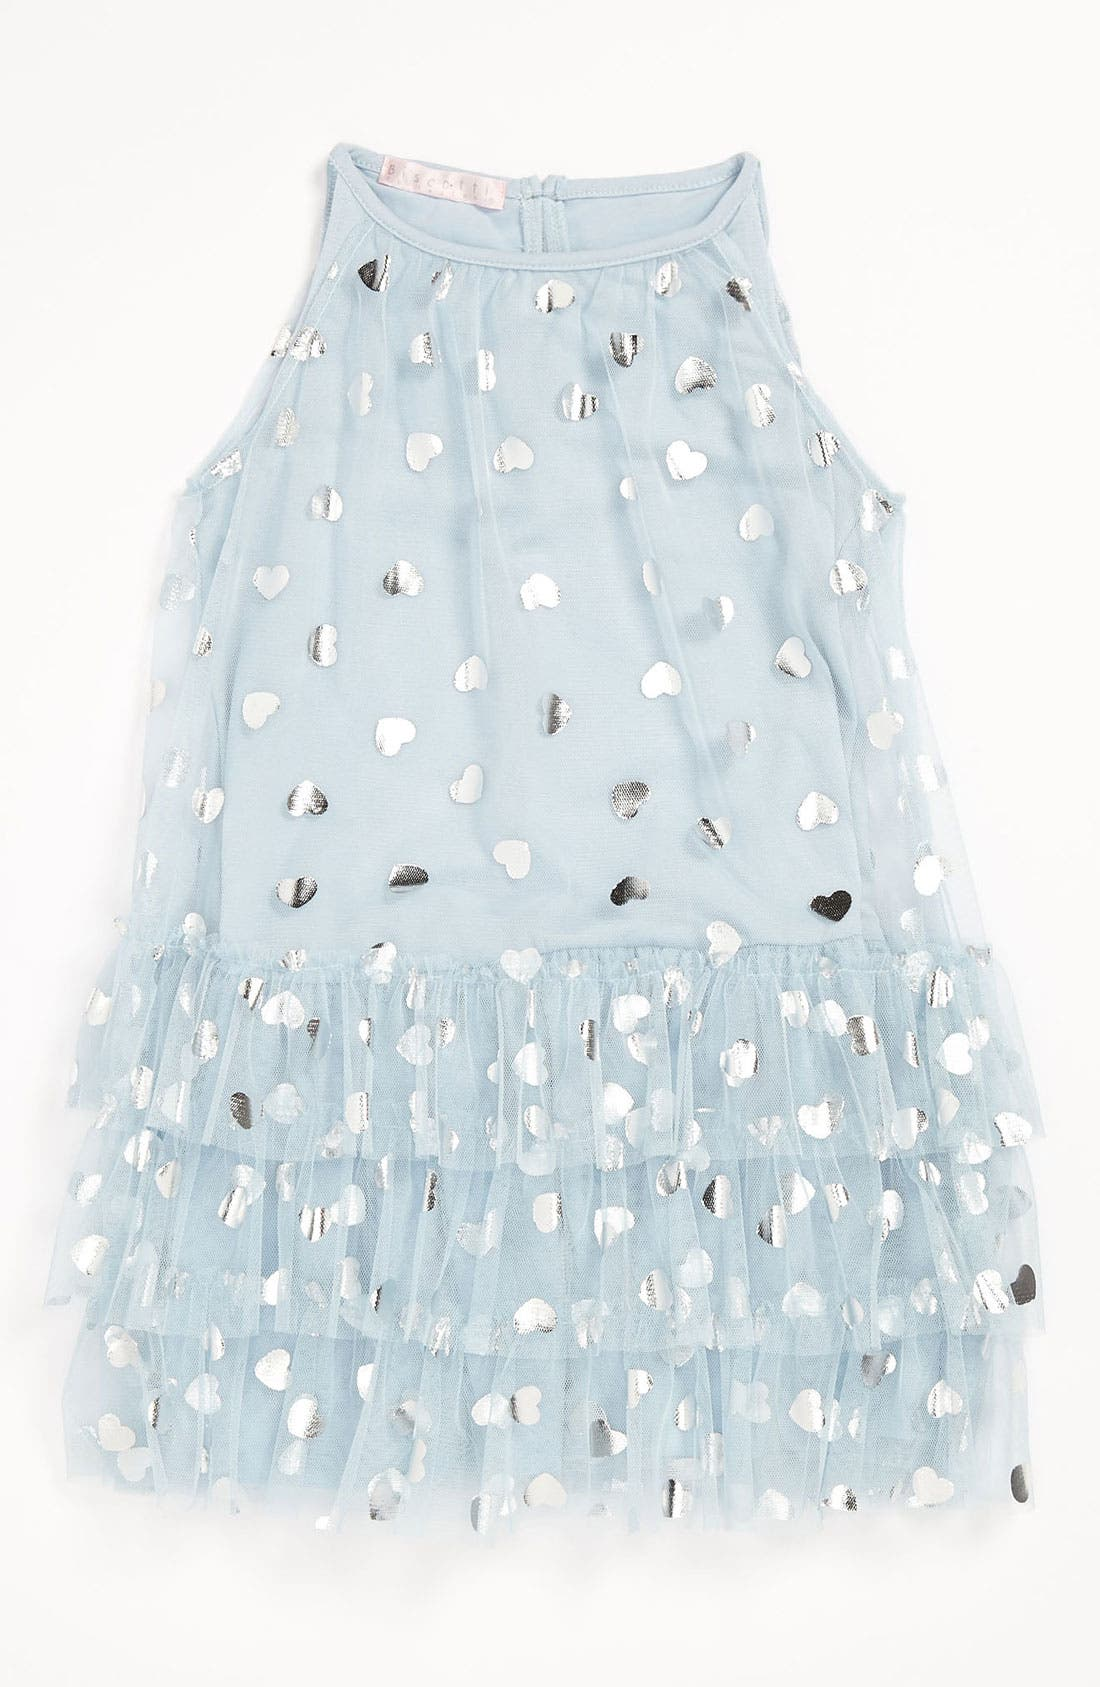 Alternate Image 1 Selected - Biscotti 'Follow Your Heart' Dress (Little Girls)